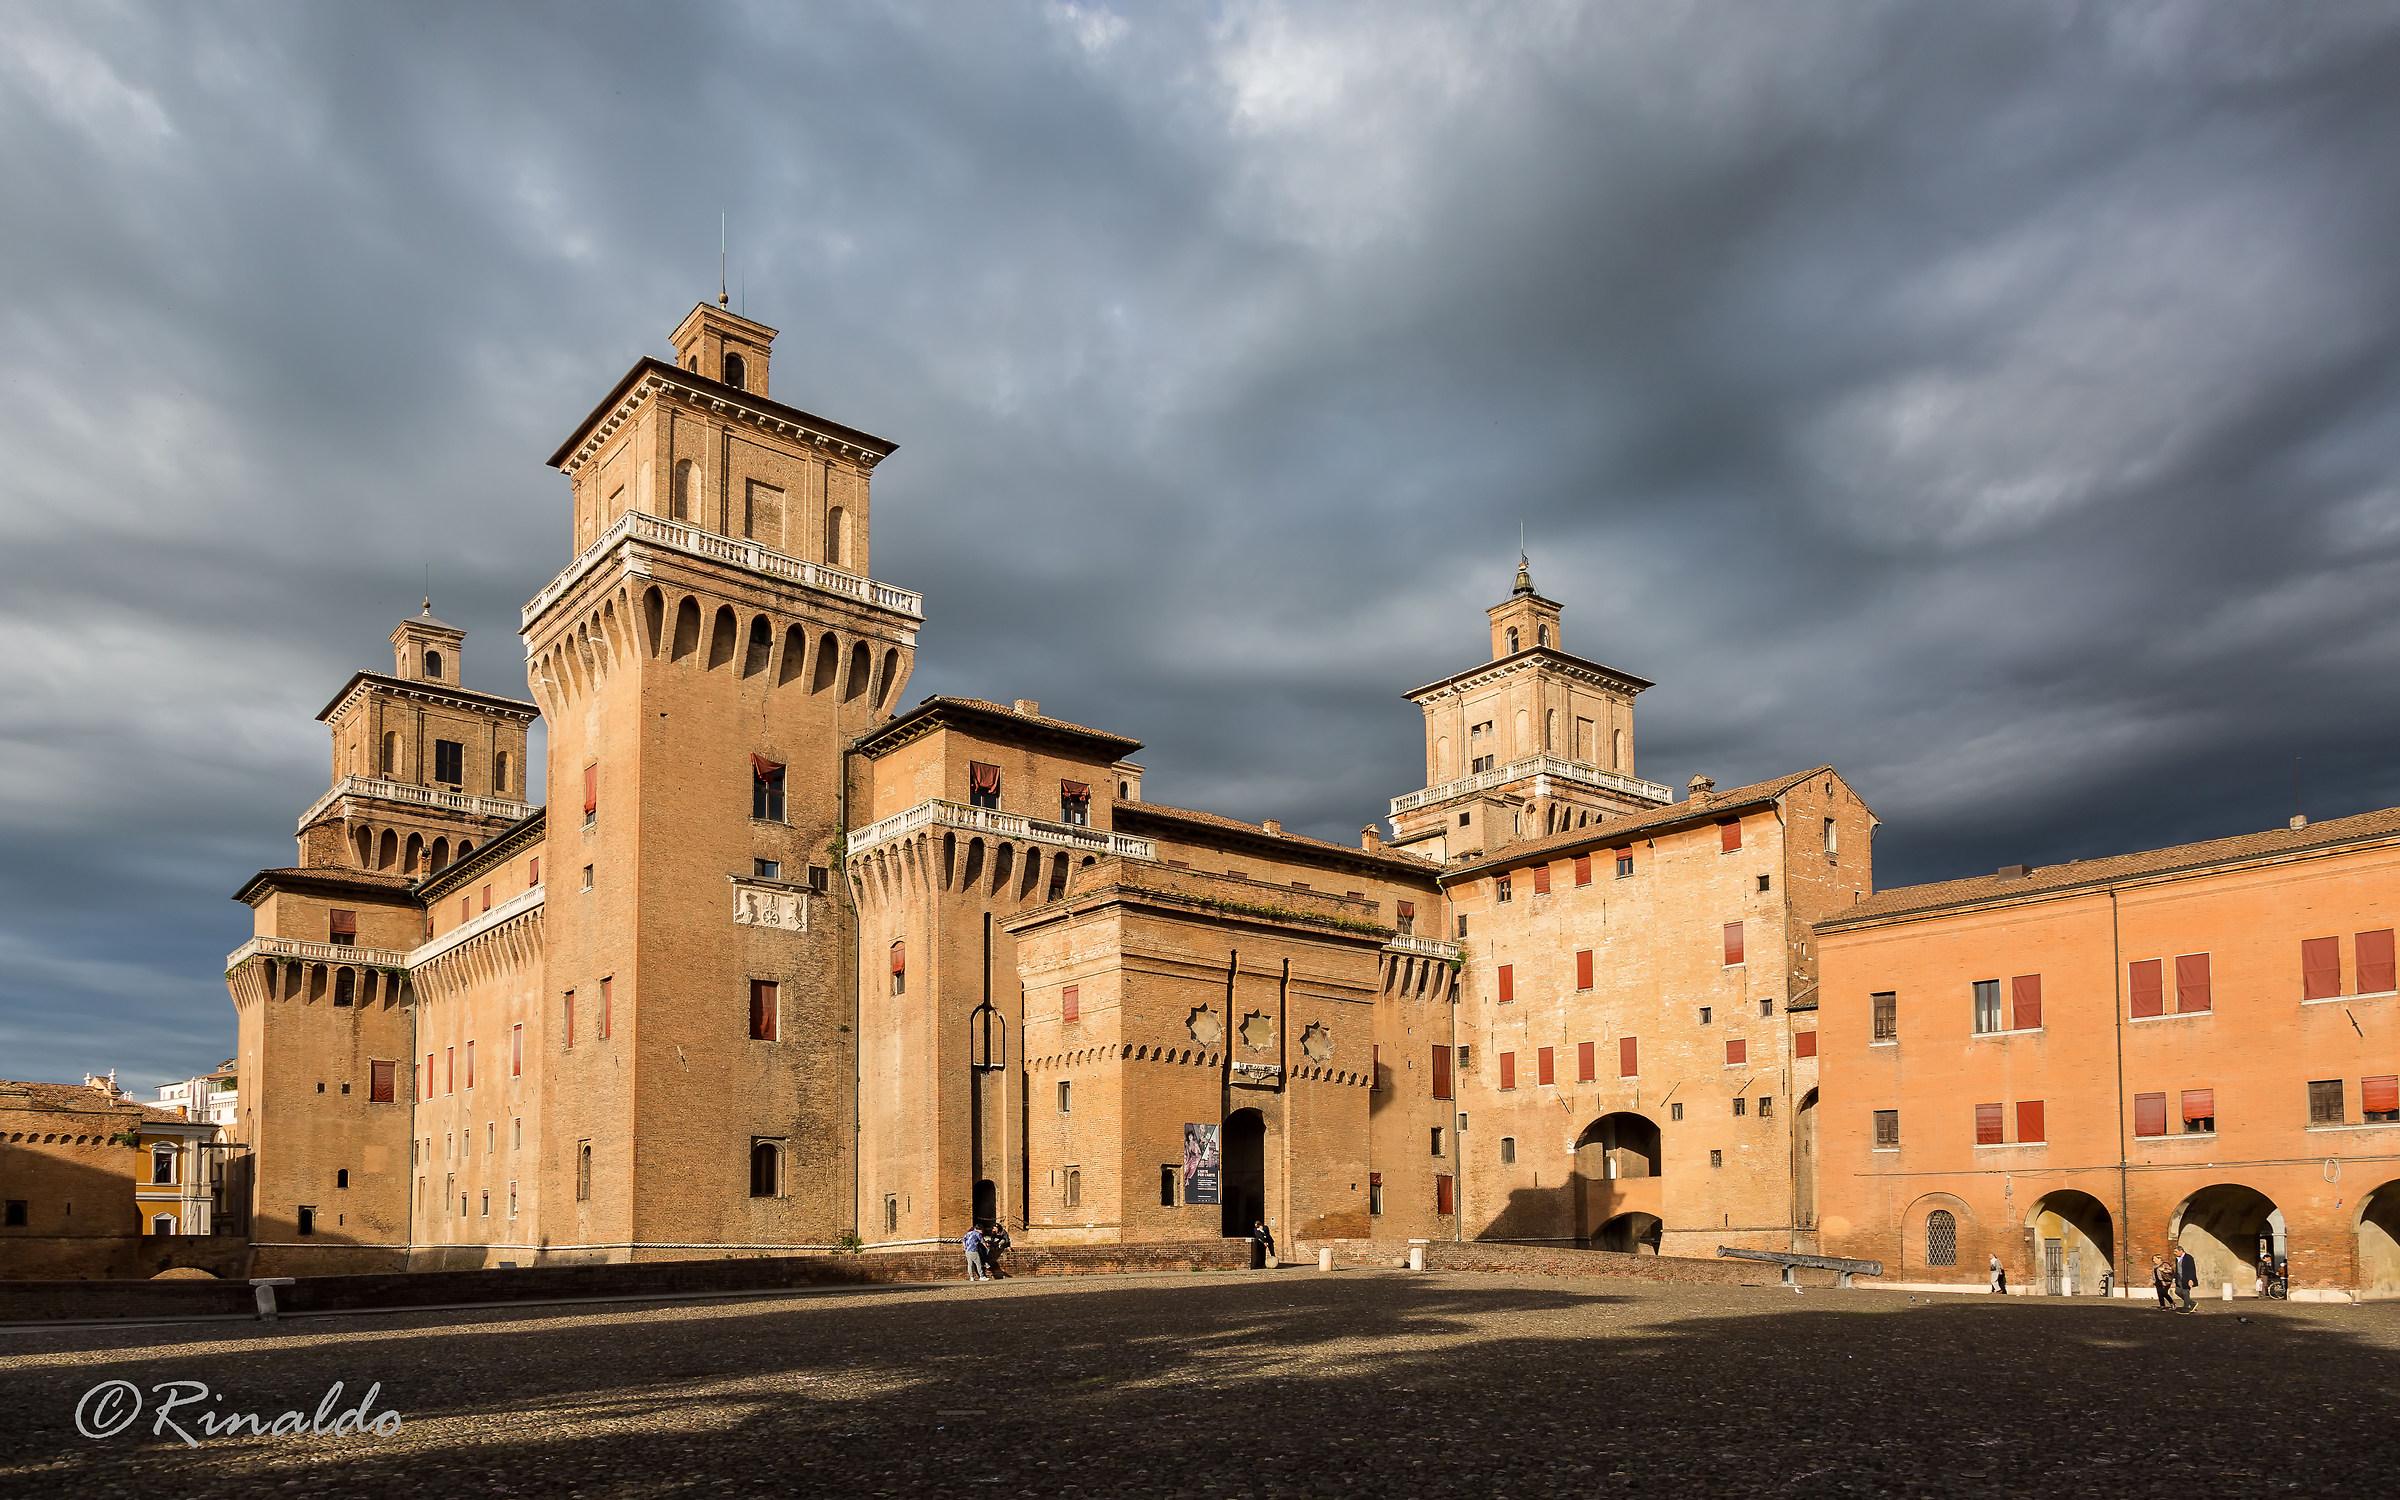 The Estense castle of Ferrara...